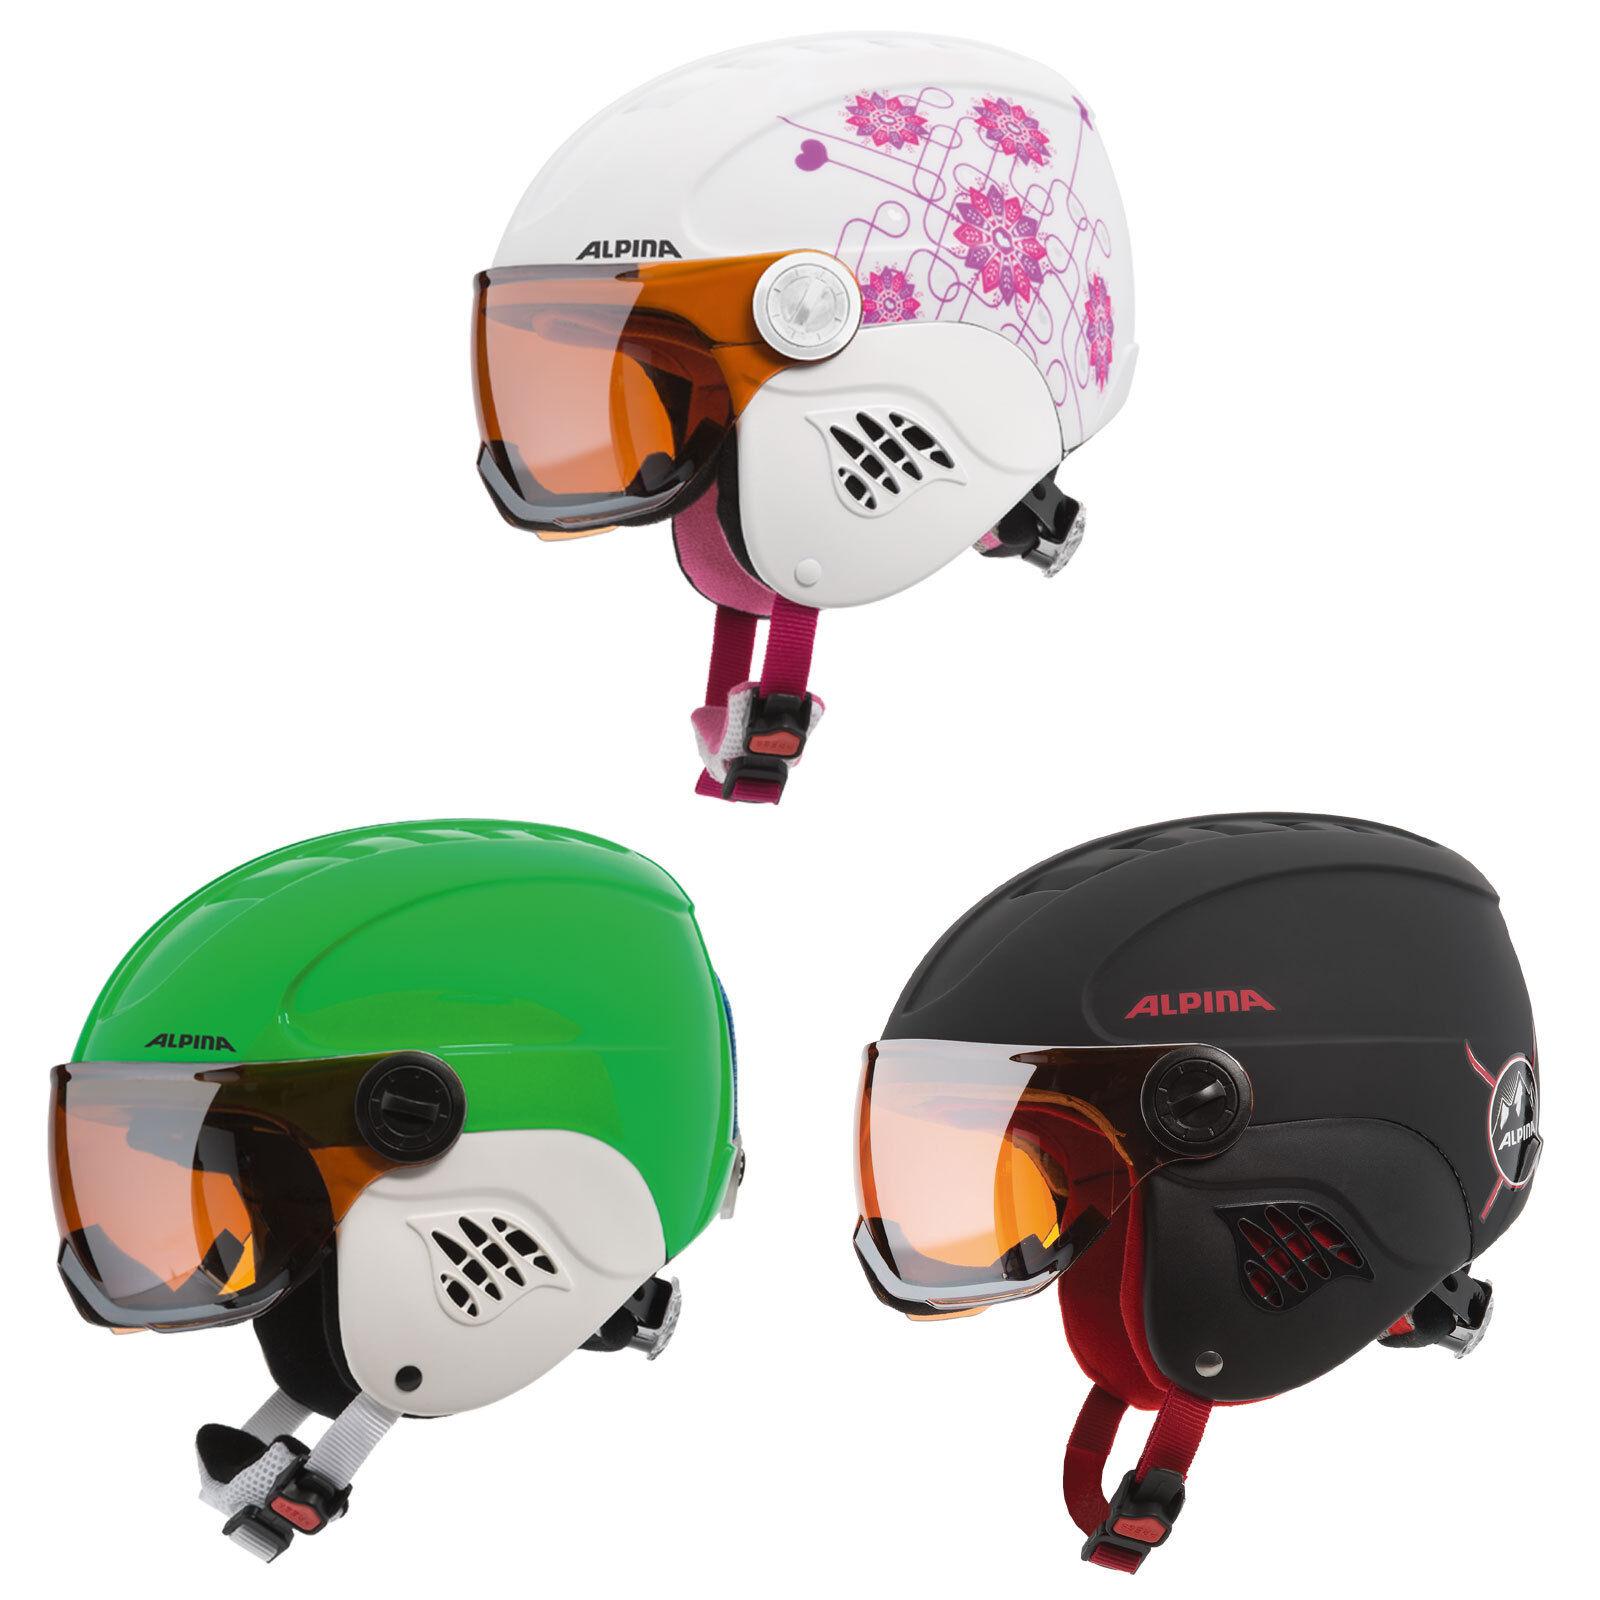 Alpina Carat Visor Kinder-Snowboardhelm  Skihelm Snowboard Ski Helm mit Visier